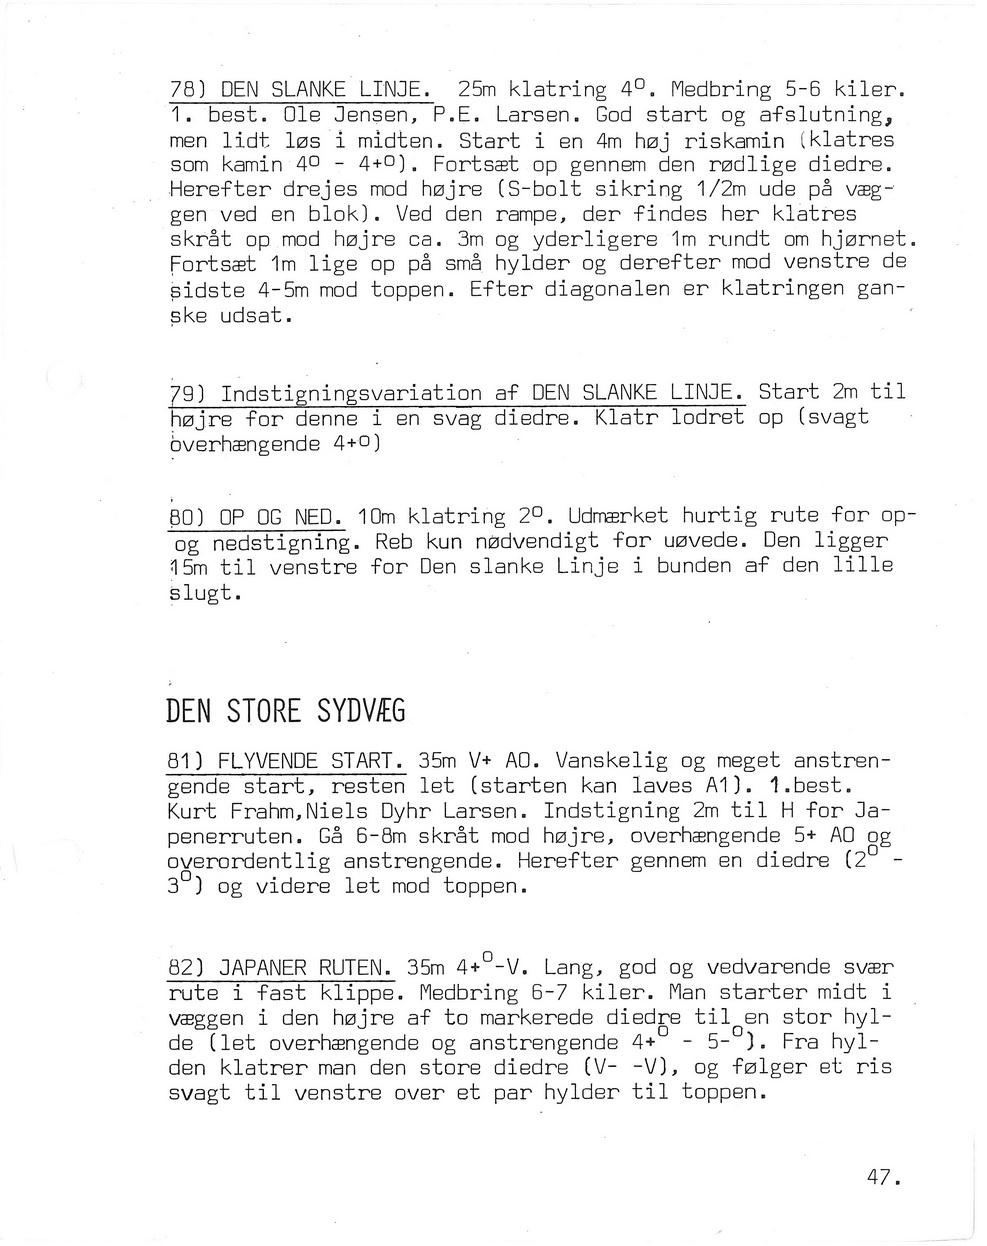 Kullen guide 1972 047.jpg